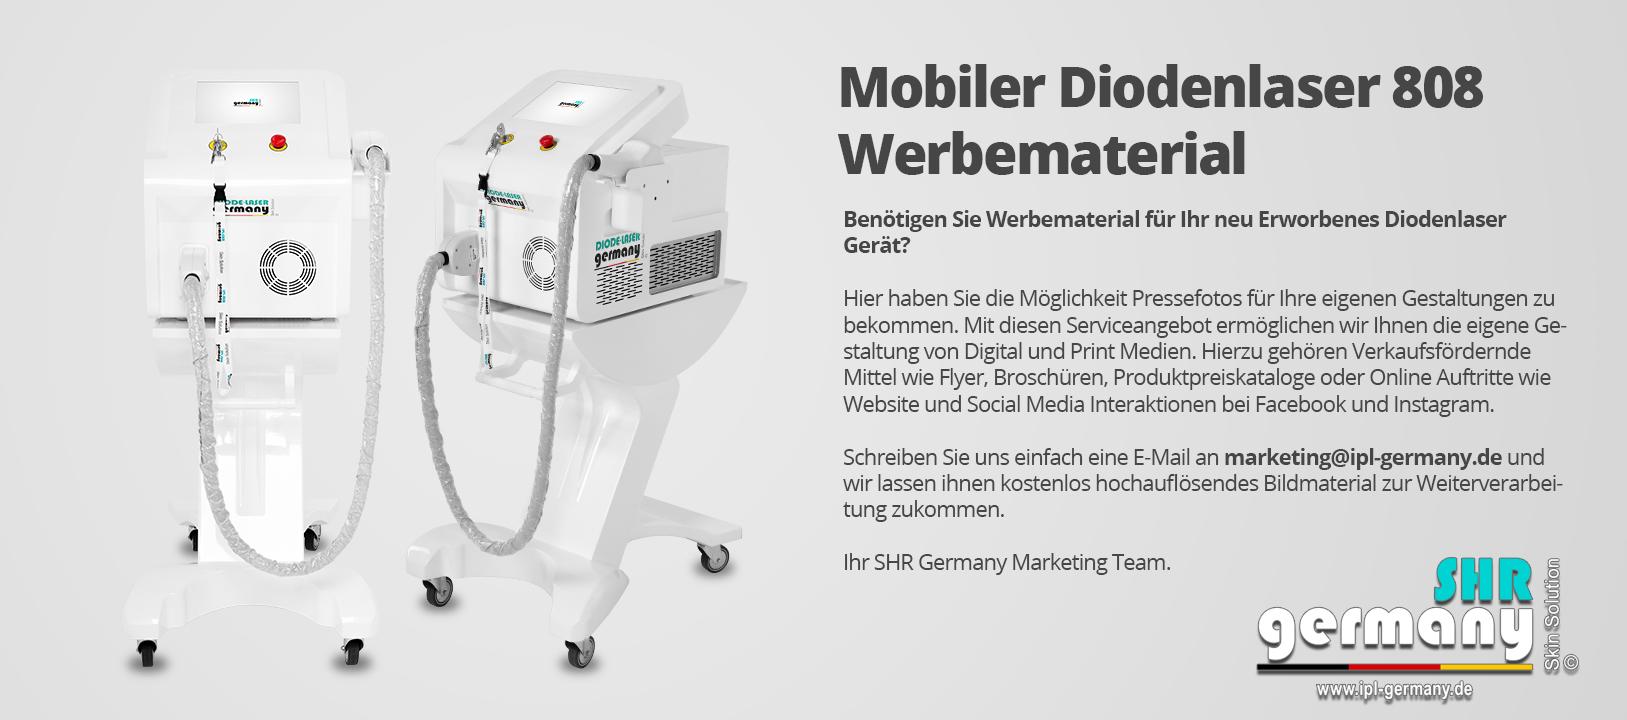 SHR_Germany_Diodenlaser_mobil_Werbematerial